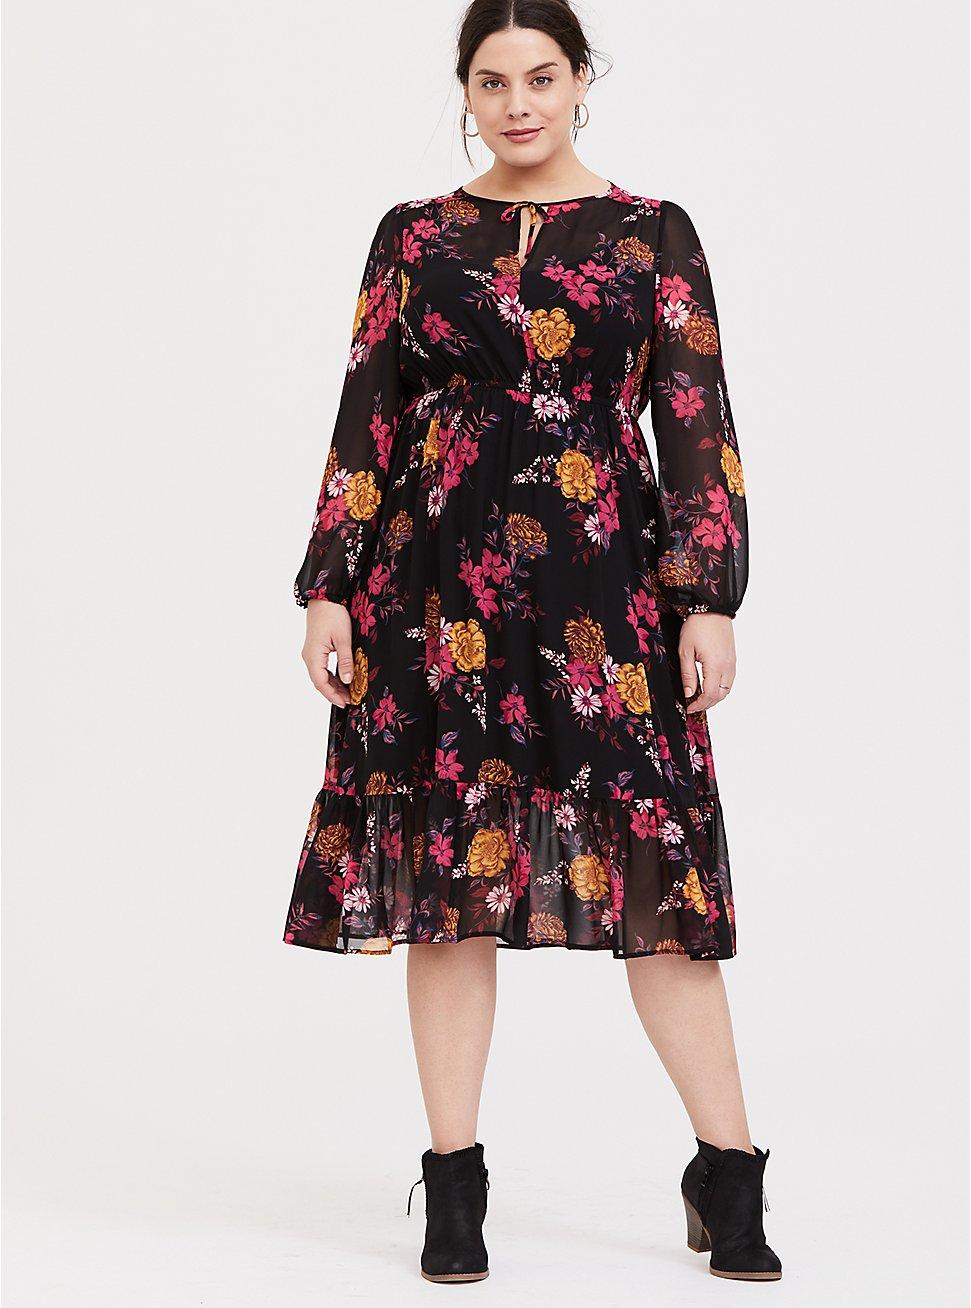 Plus Size Black Floral Chiffon Midi Dress, FLORALS-BLACK, hi-res